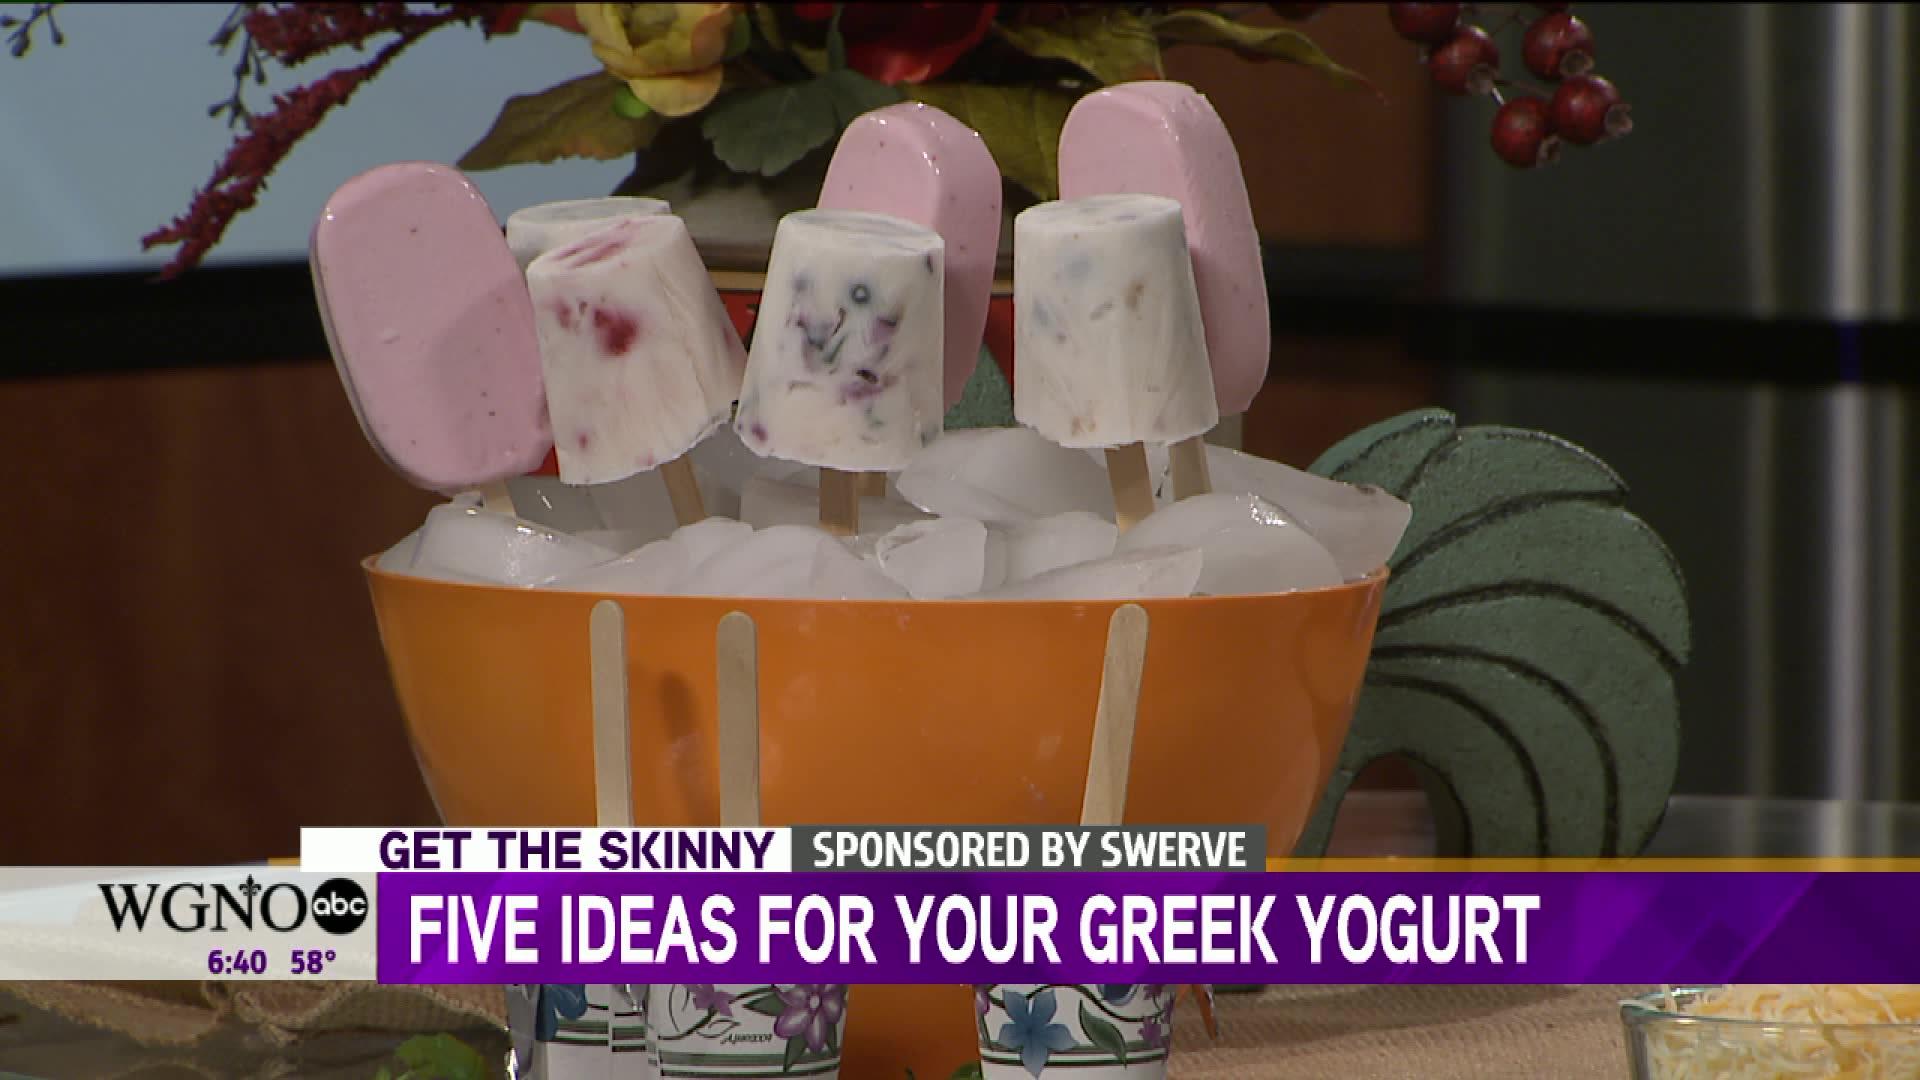 5 Skinny Recipe Ideas Using Greek Yogurt